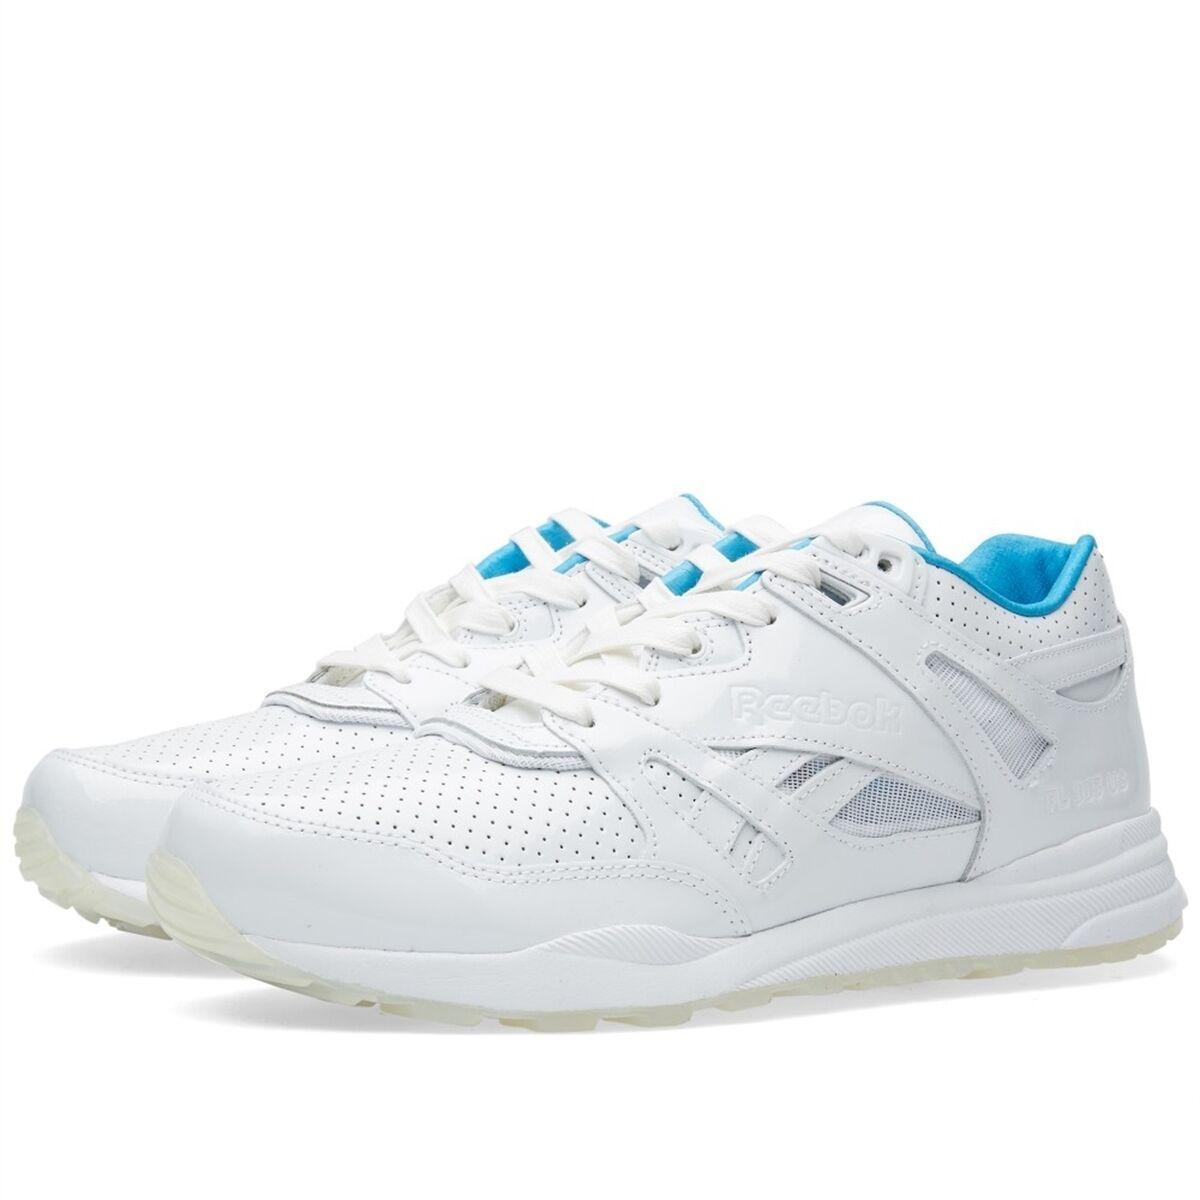 la reebok uomini scarpe da ginnastica respiratore nc bianco